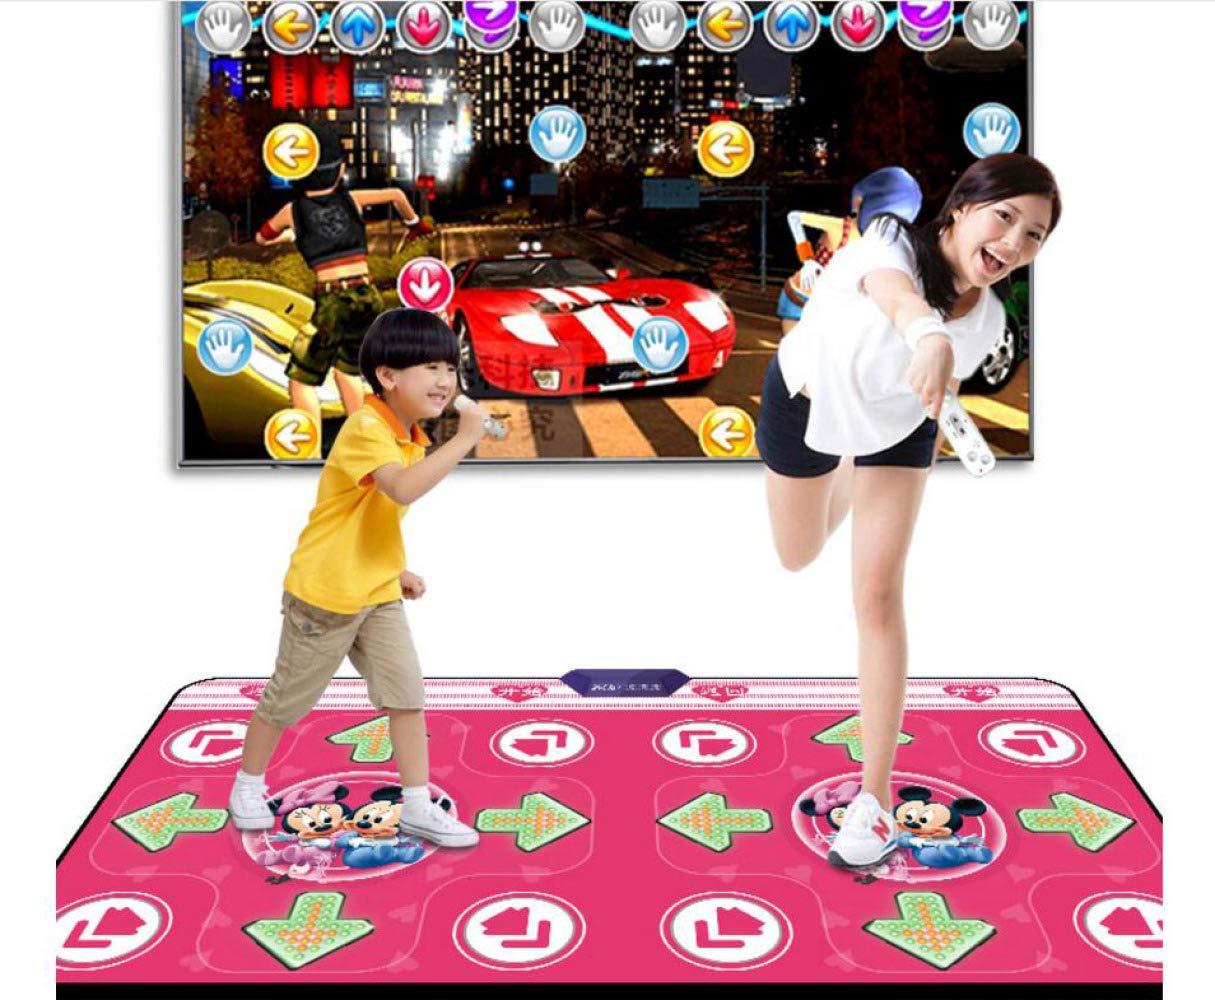 QXMEI Dual-use Dance Mat Double Computer TV Interface Thick Wireless Body Dance Machine by QXMEI (Image #1)